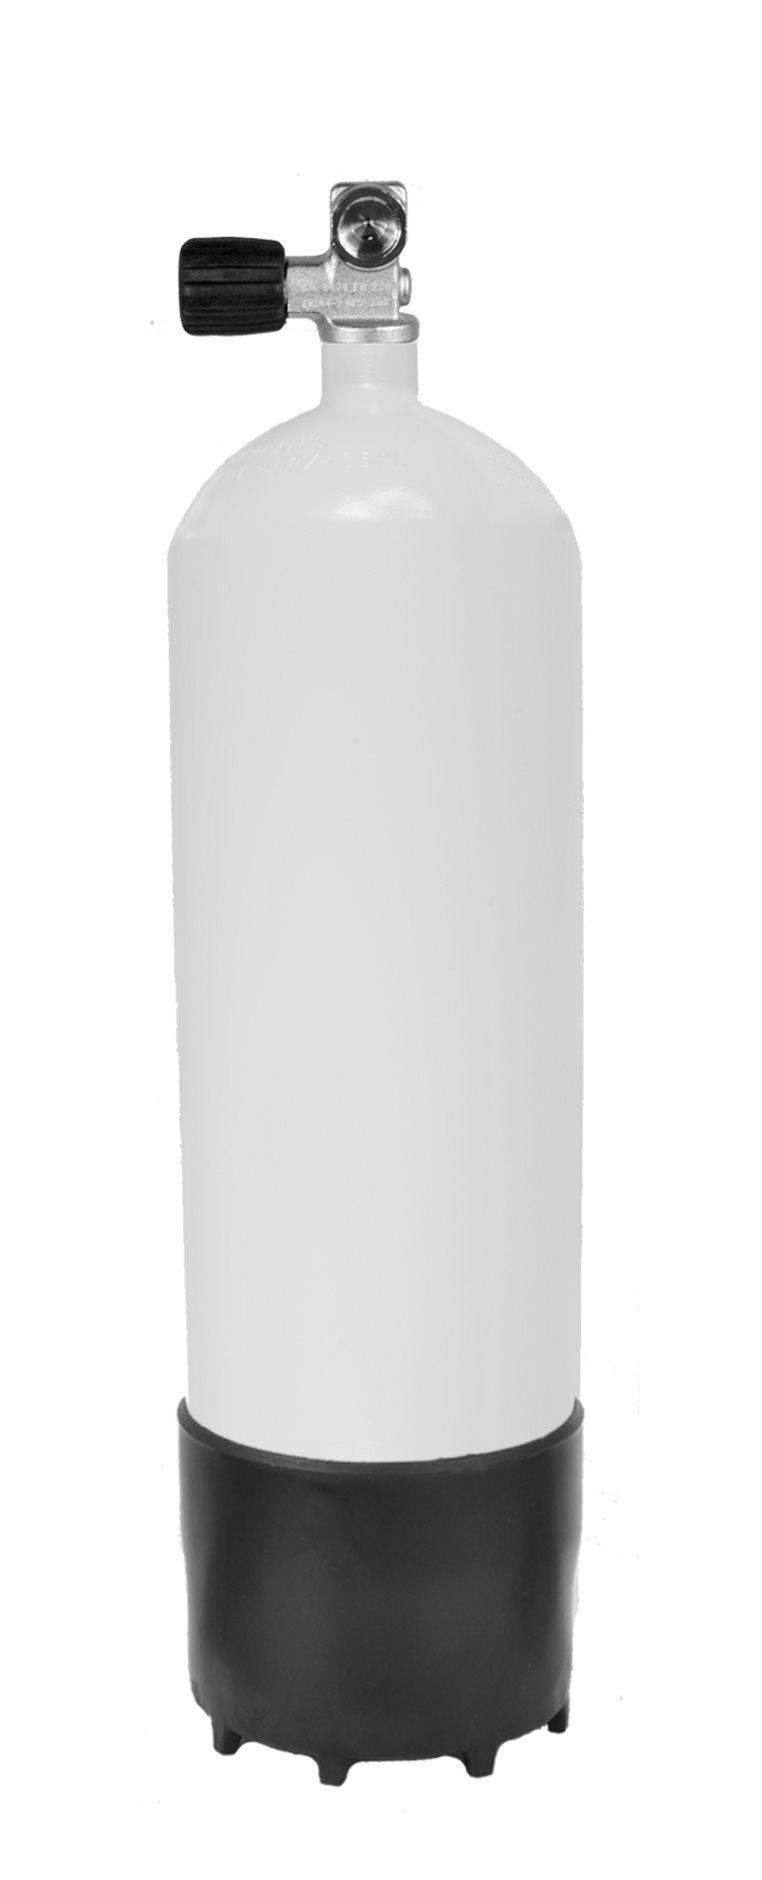 Водолазна бутилка 10 л / 300 бара - Eurocylinder